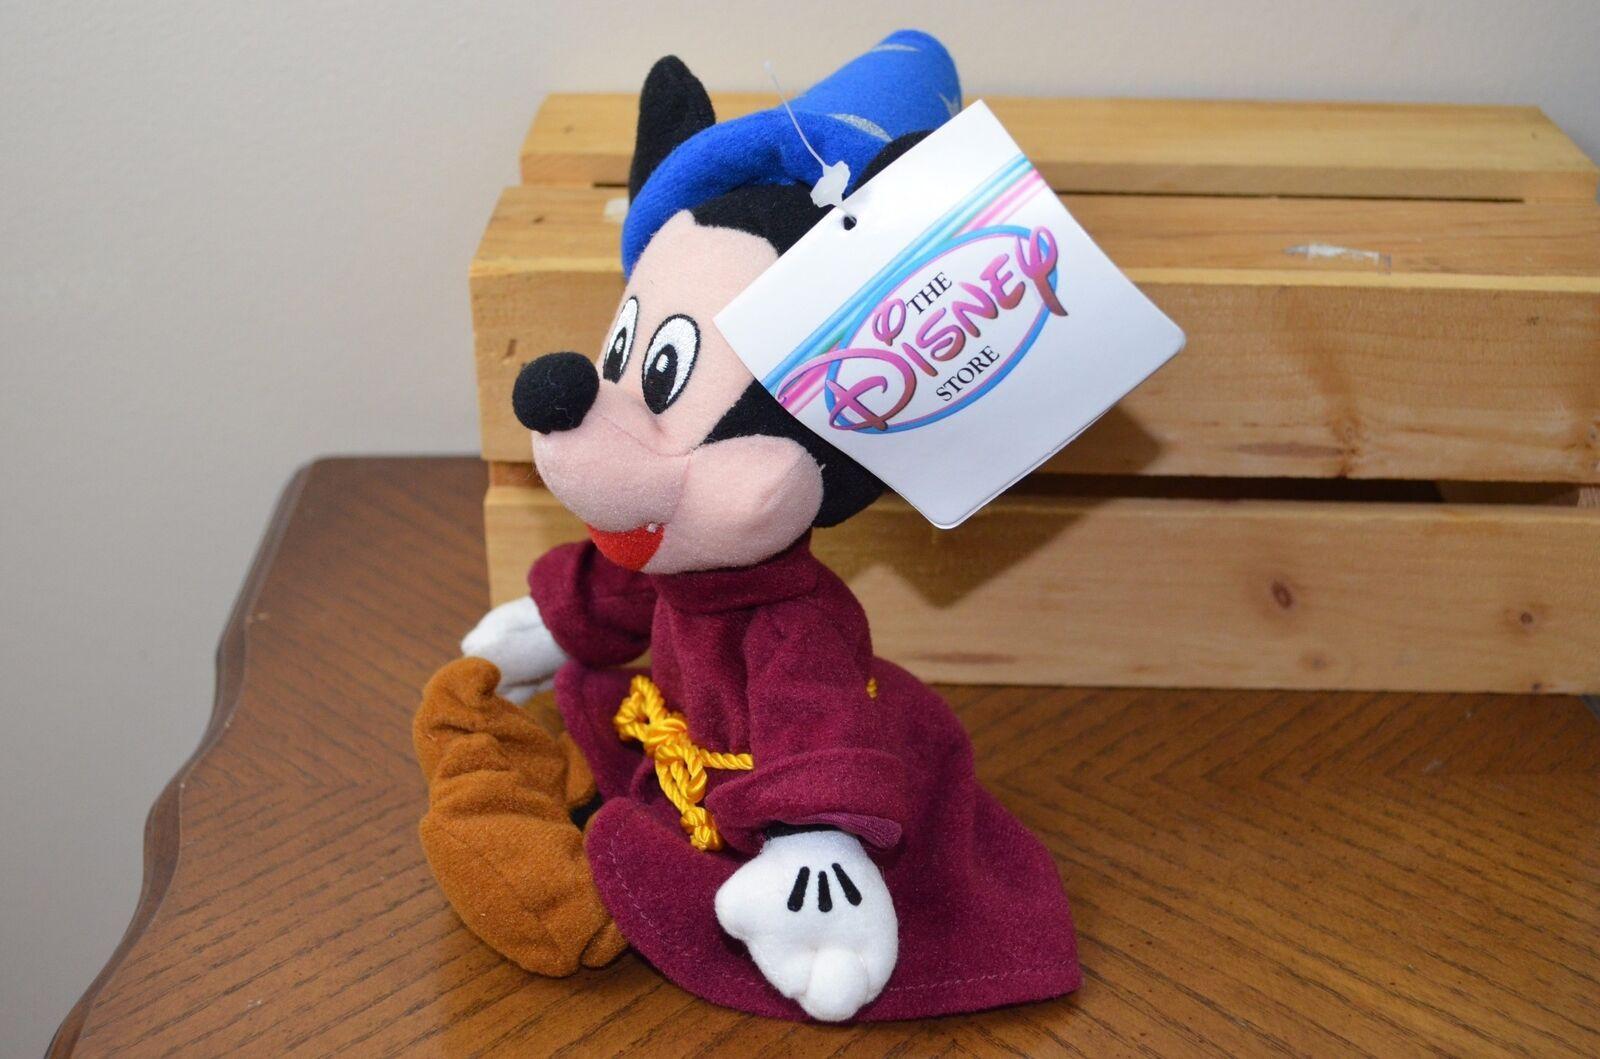 fa570830d2c Mickey Mouse Fantasia Sorcerer Disney Store Mini Bean Bag Beanie Plush Doll  11